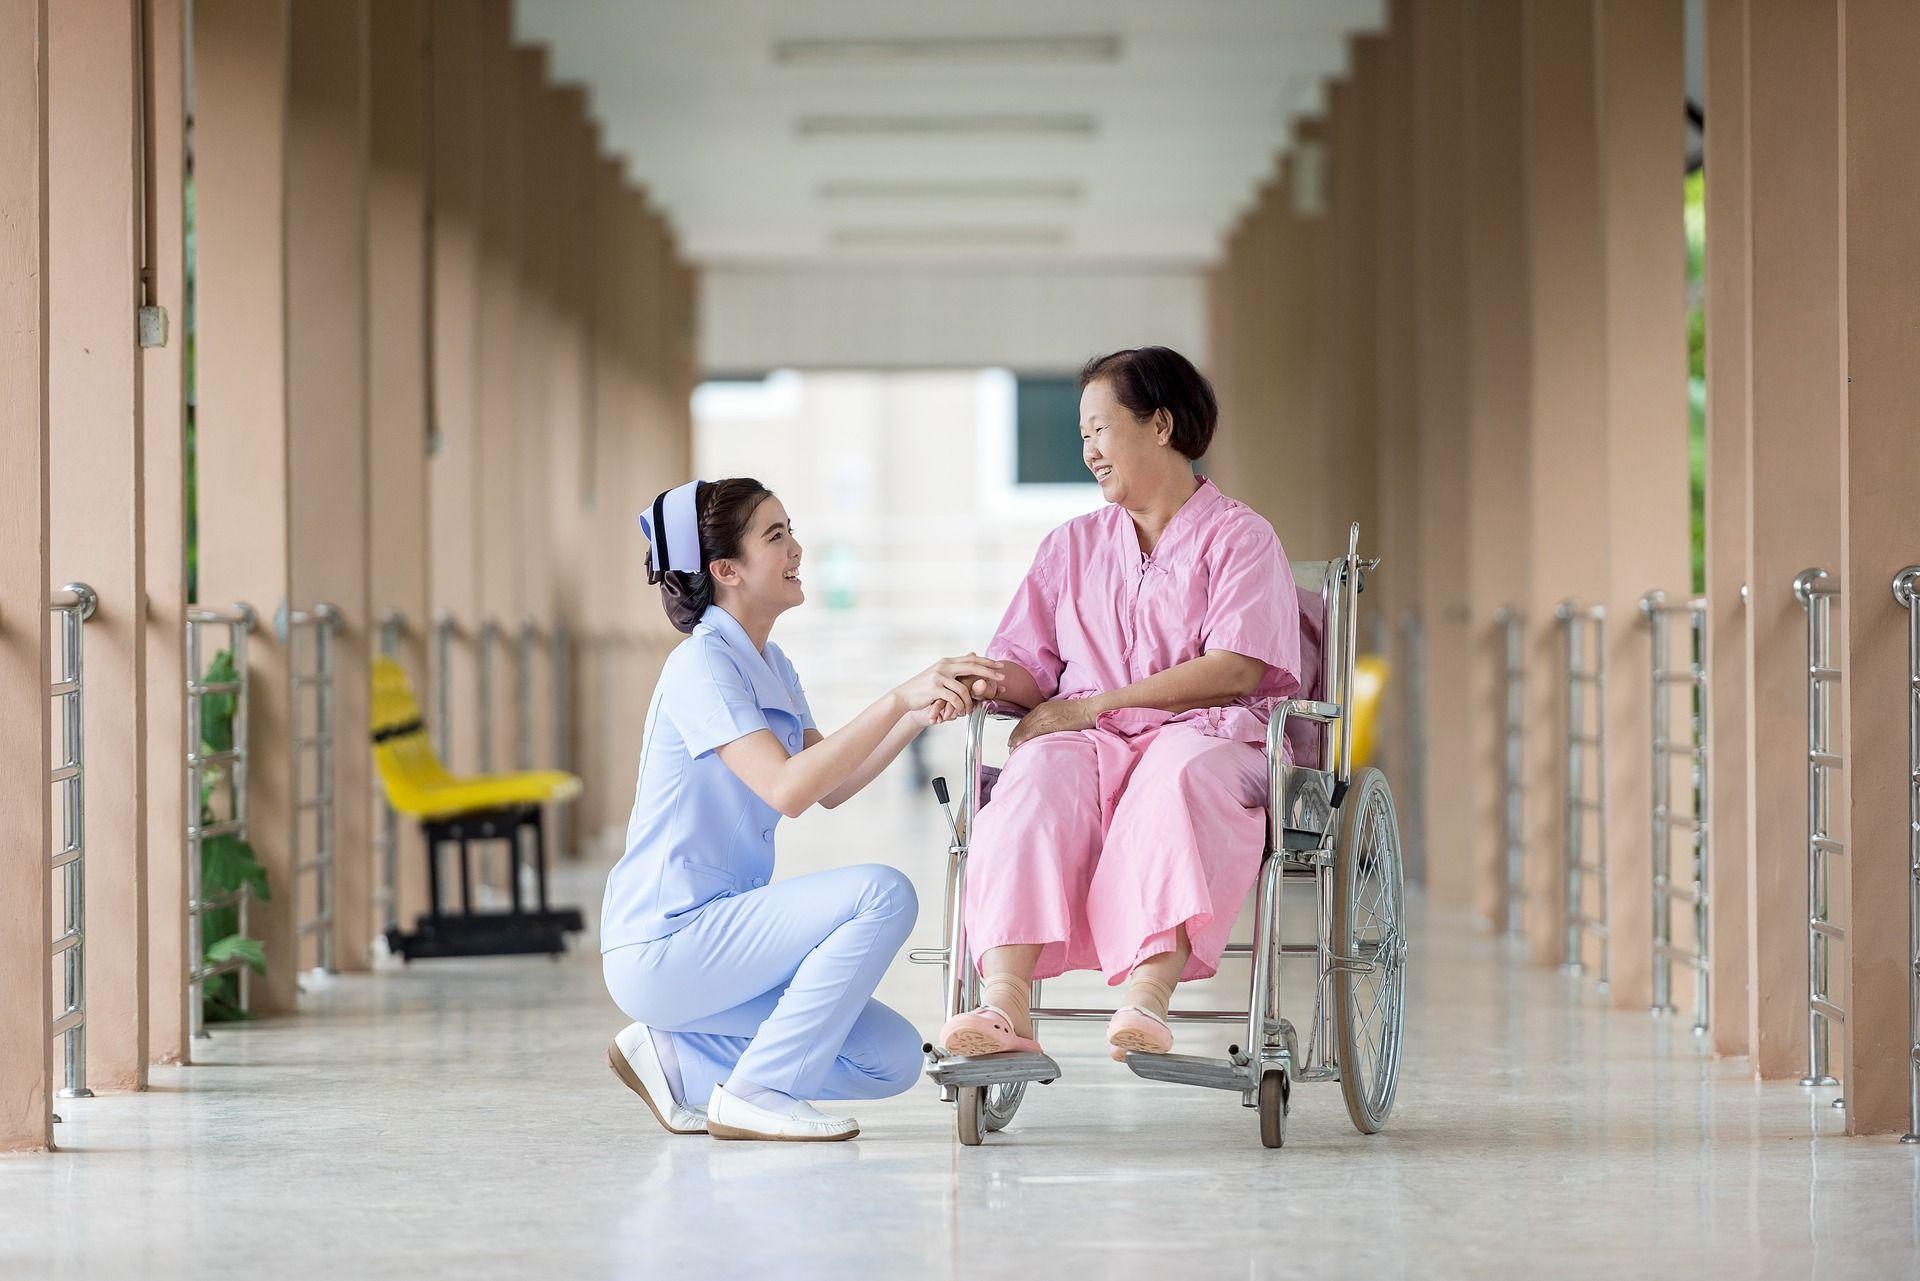 hospital-1822460_1920